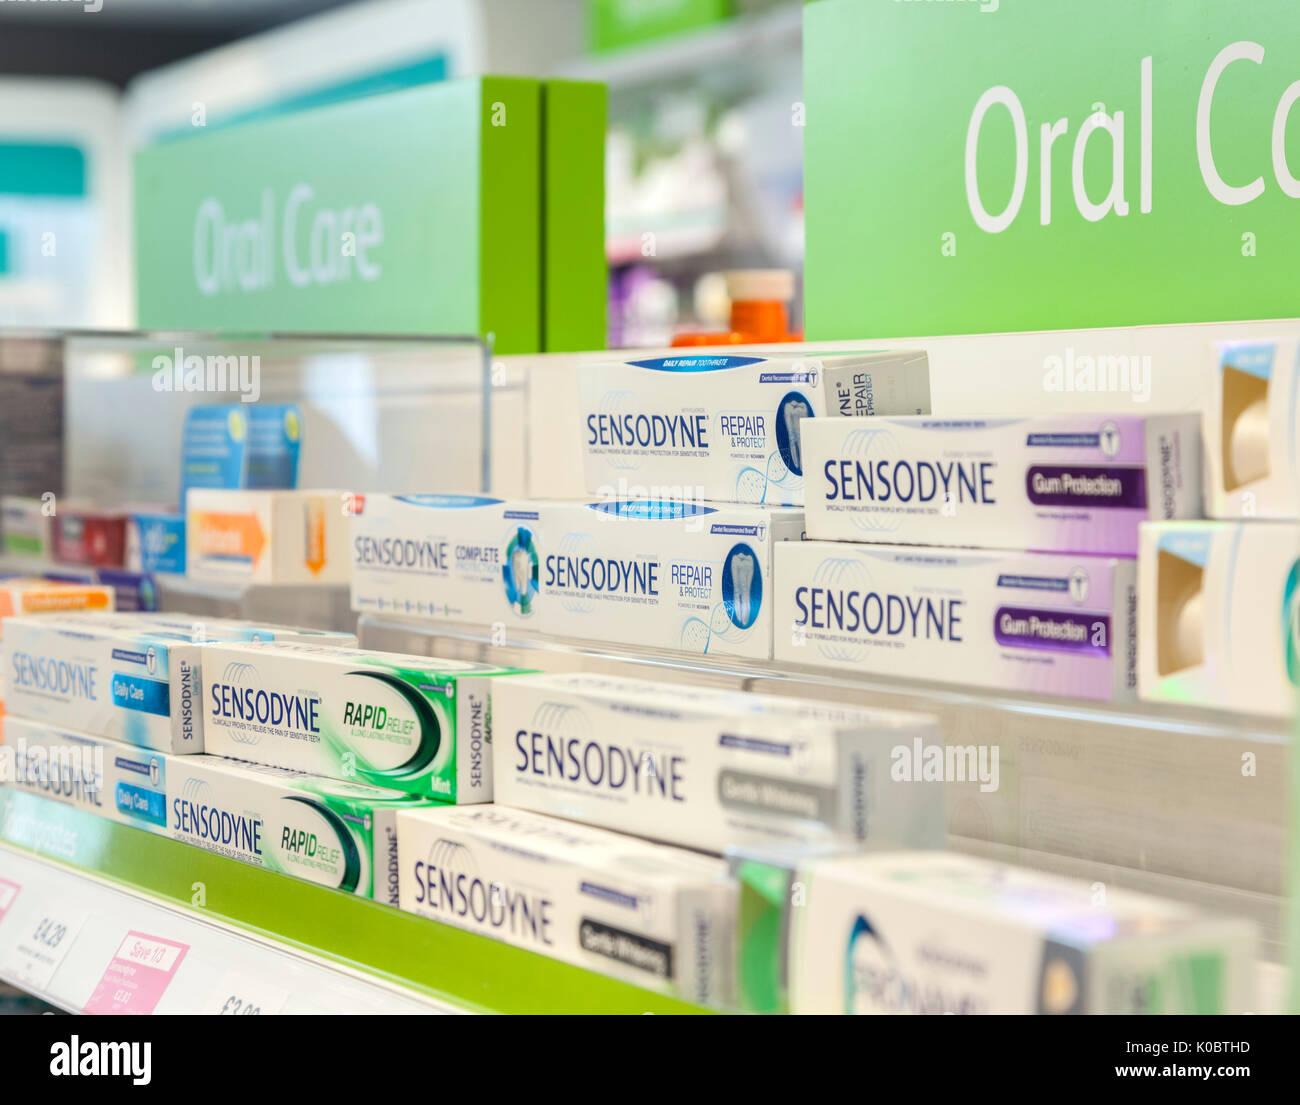 Sensodyne products on sale in a chemist shop,pharmacy shelf,pharmacists,drug store - Stock Image